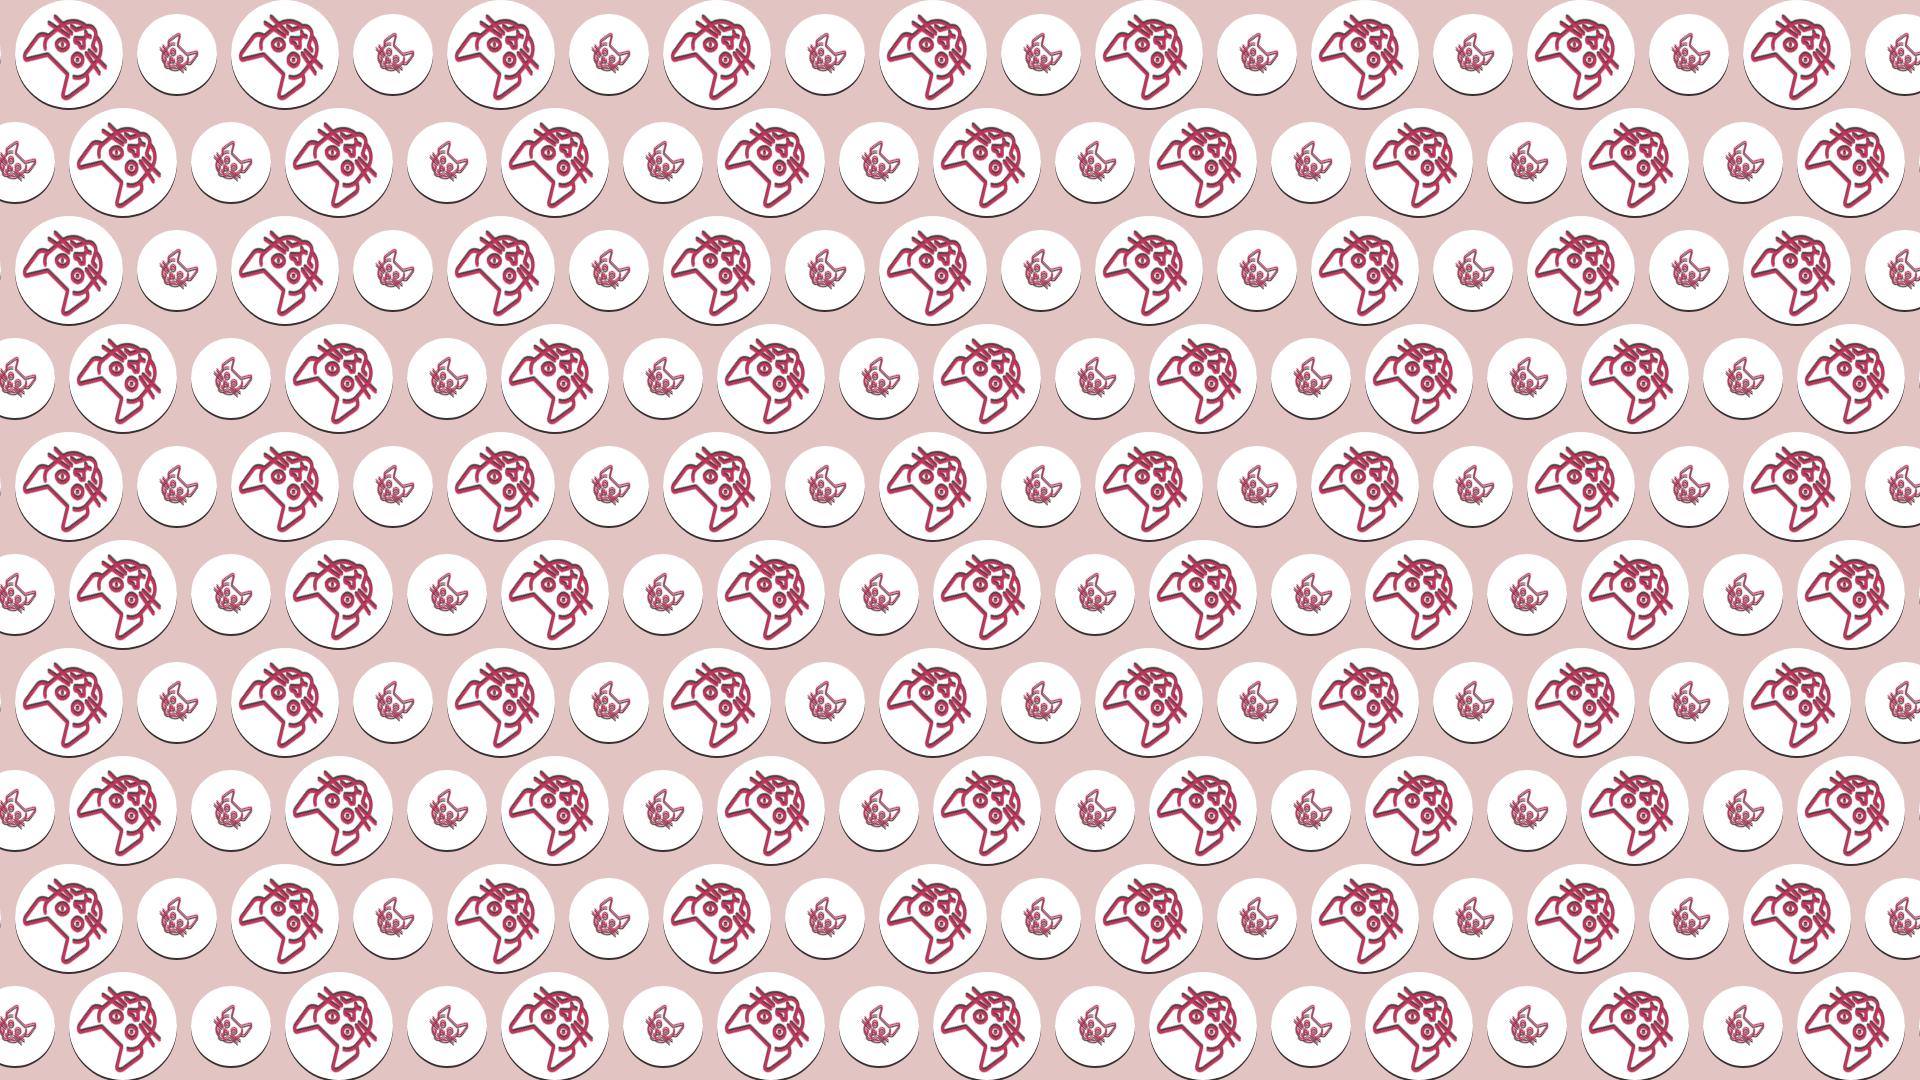 Pink, Pattern, Textile, Design, Line, Material, Font, Product, Circle, Drum, Shapes, Circular, Cat,  Free Image